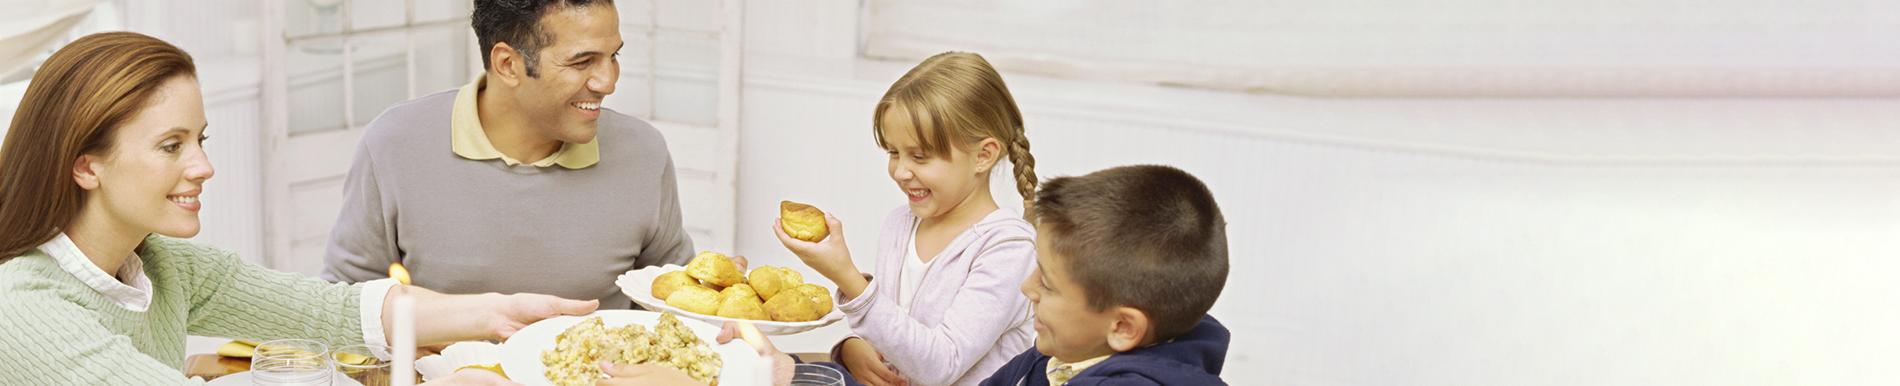 https://www.healthychildren.org/SiteCollectionImage-Homepage-Banners/Thanksgiving2020Banner_es.jpg?csf=1&e=tB3Qb0